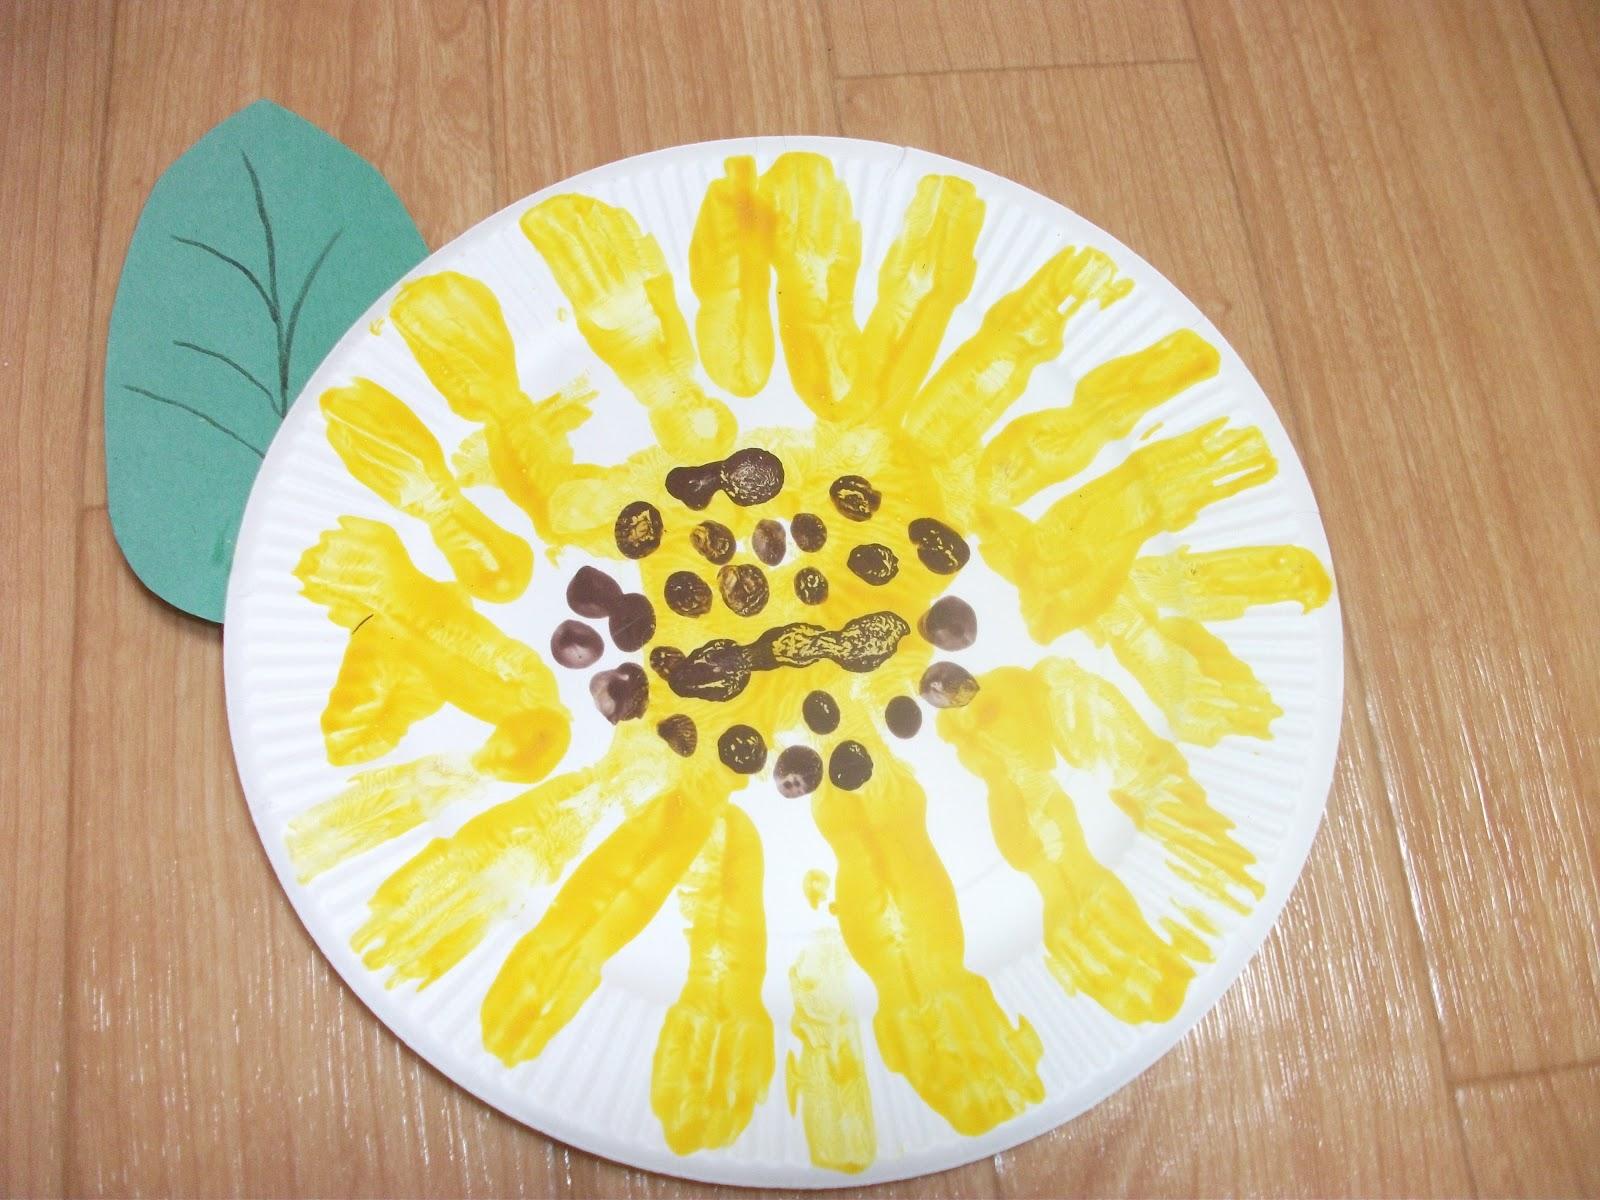 Preschool Crafts For Kids Easy Paper Plate Sunflower Craft